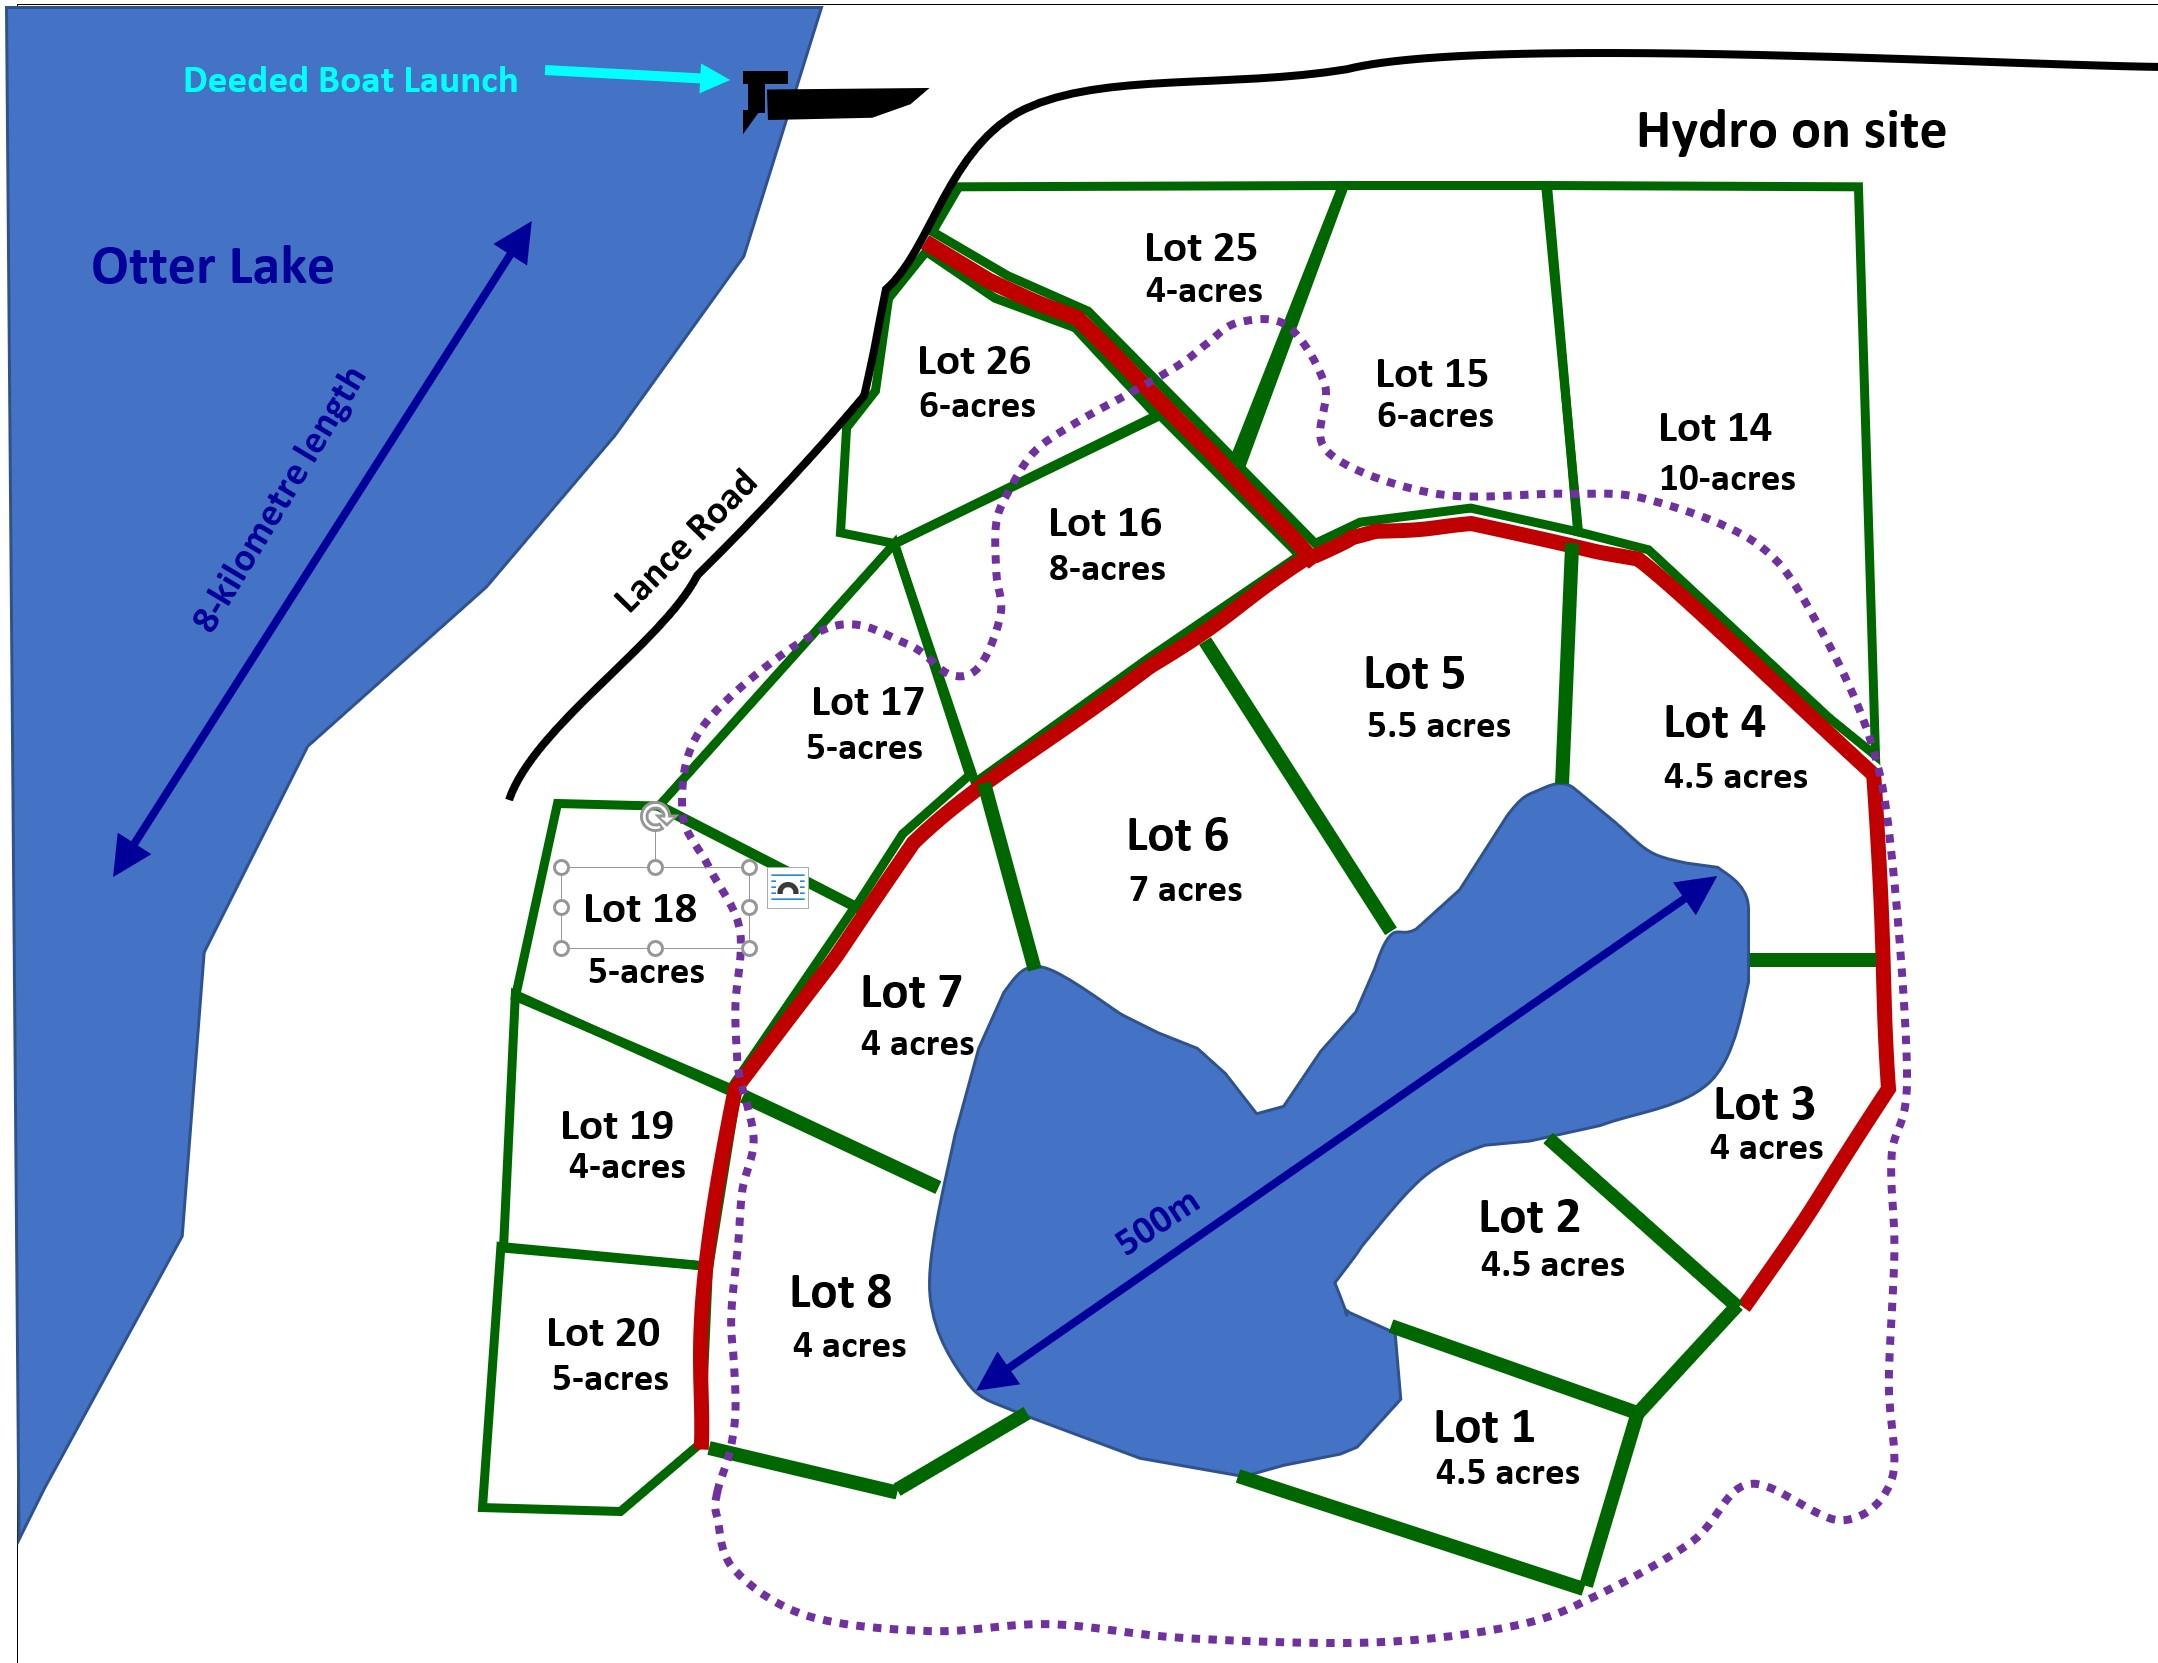 2021-07-01 - Lac Weller Cottage Lots